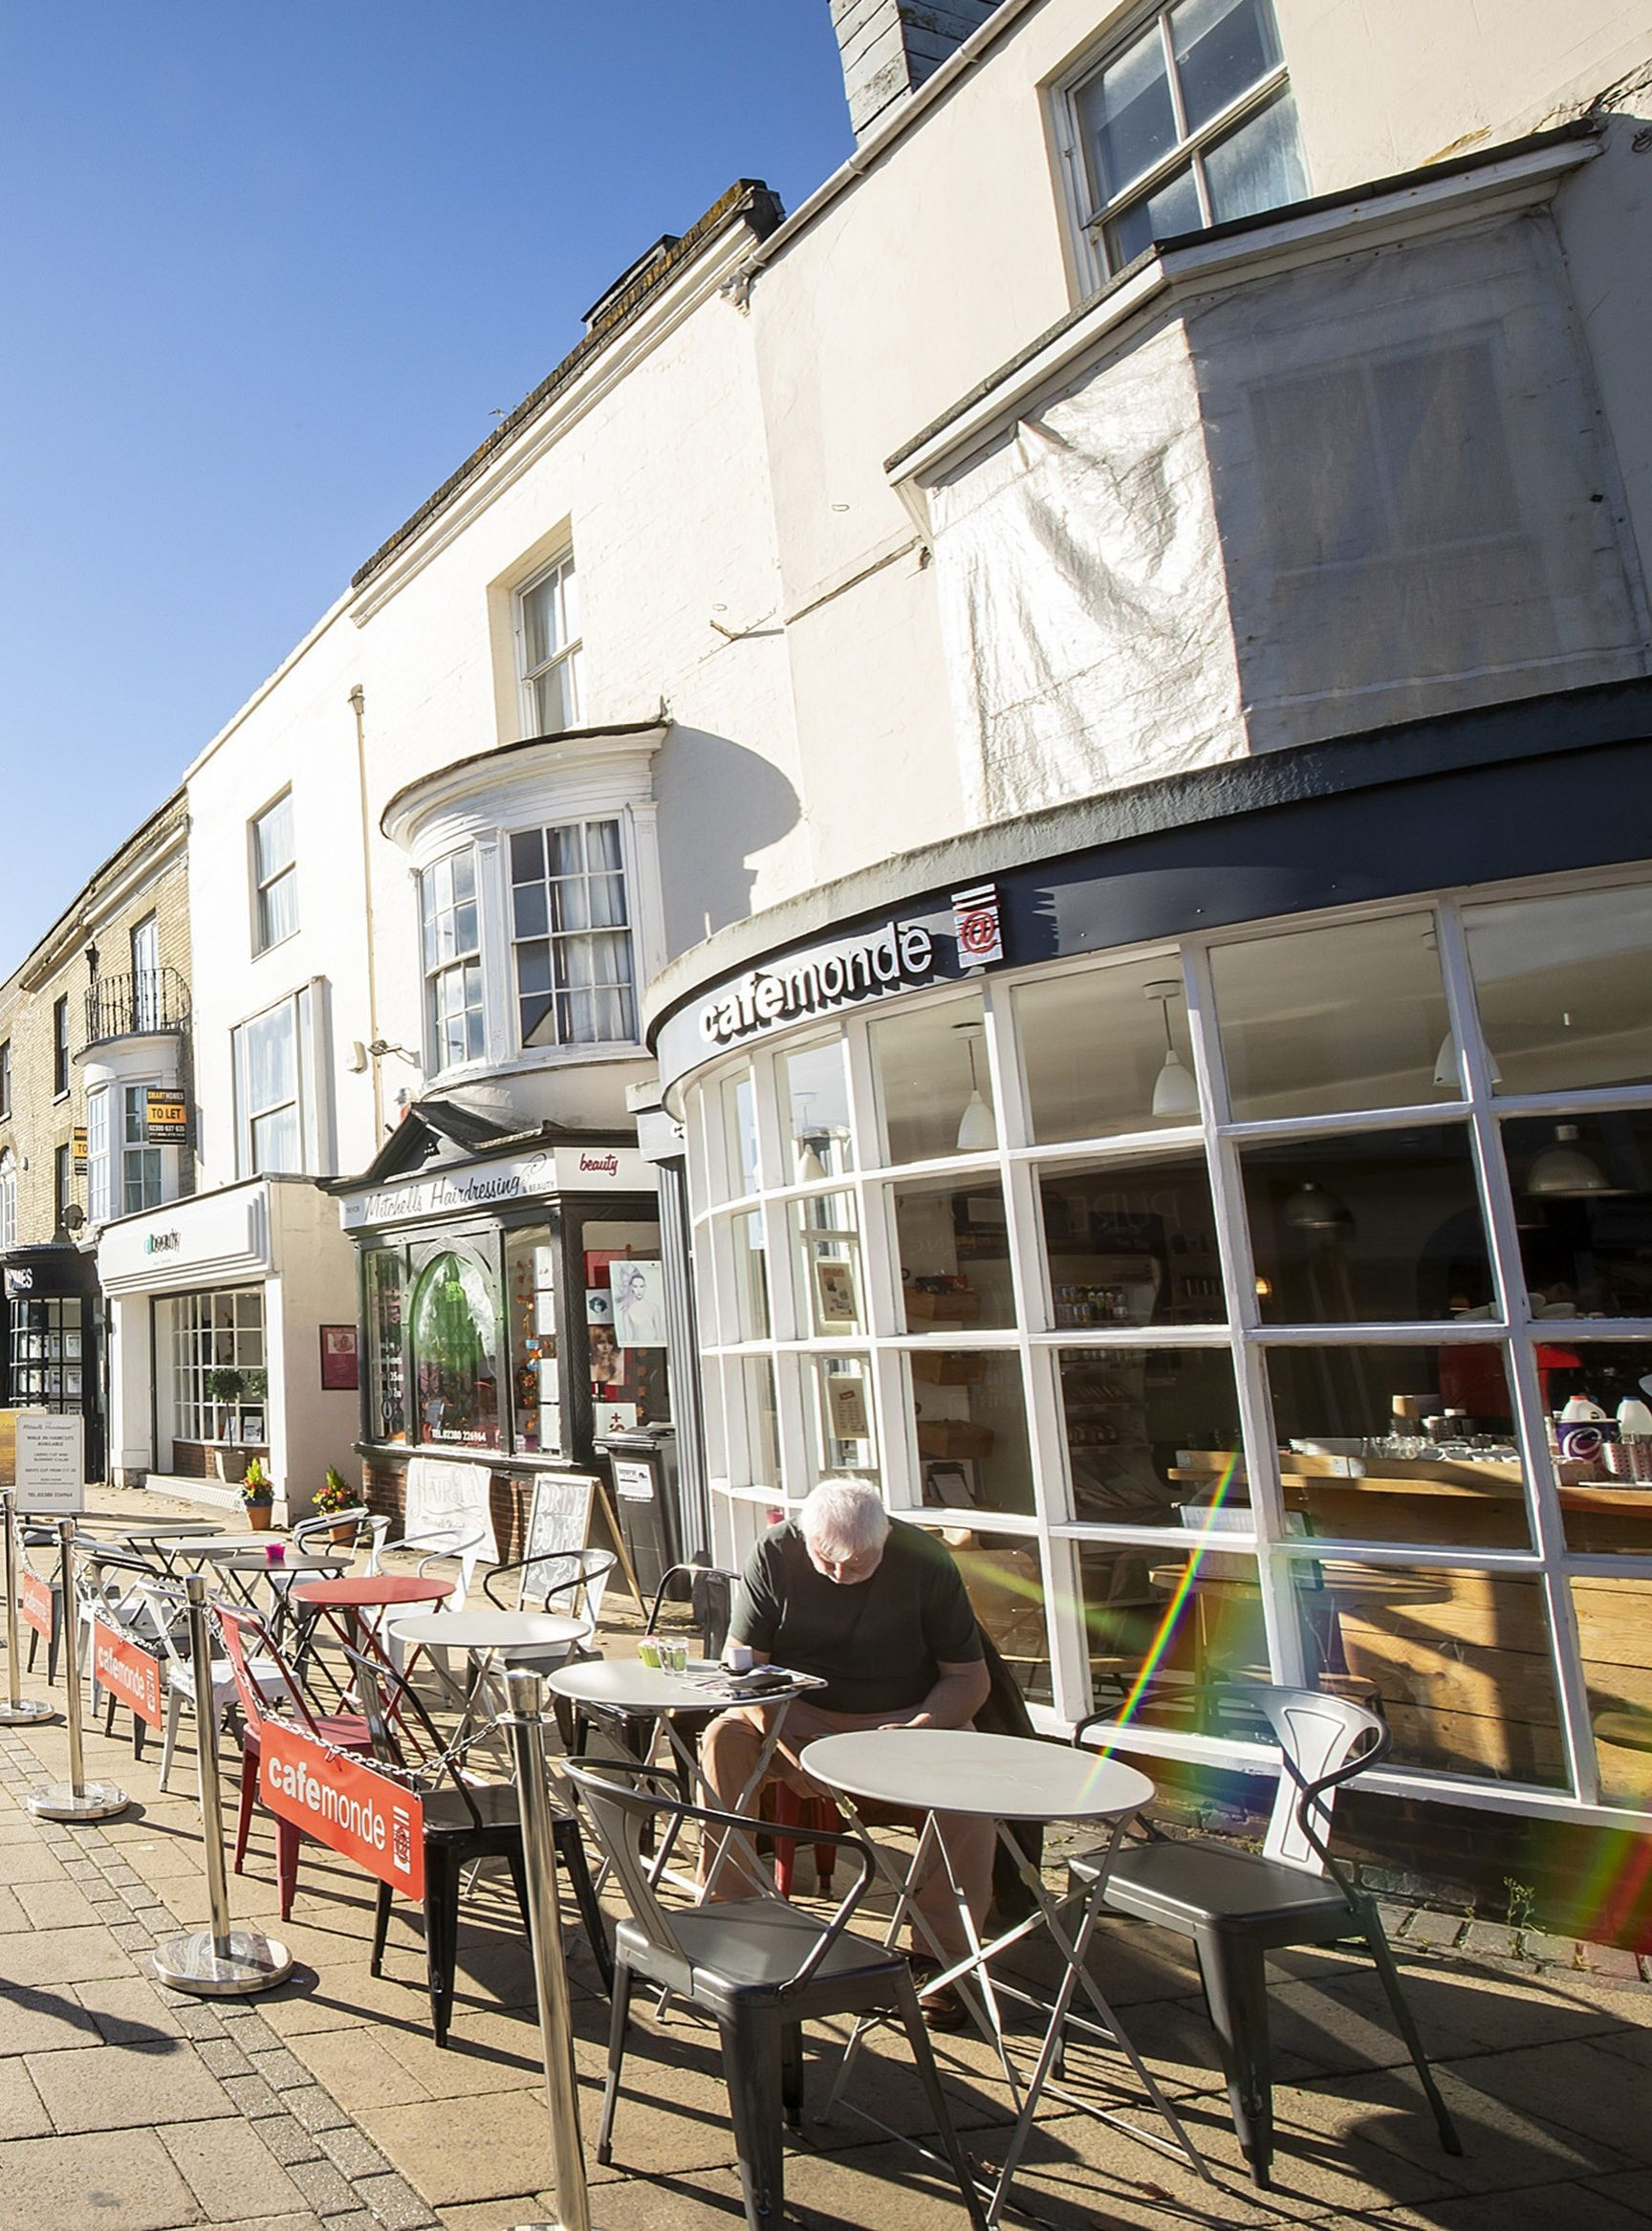 exterior of Cafe Monde